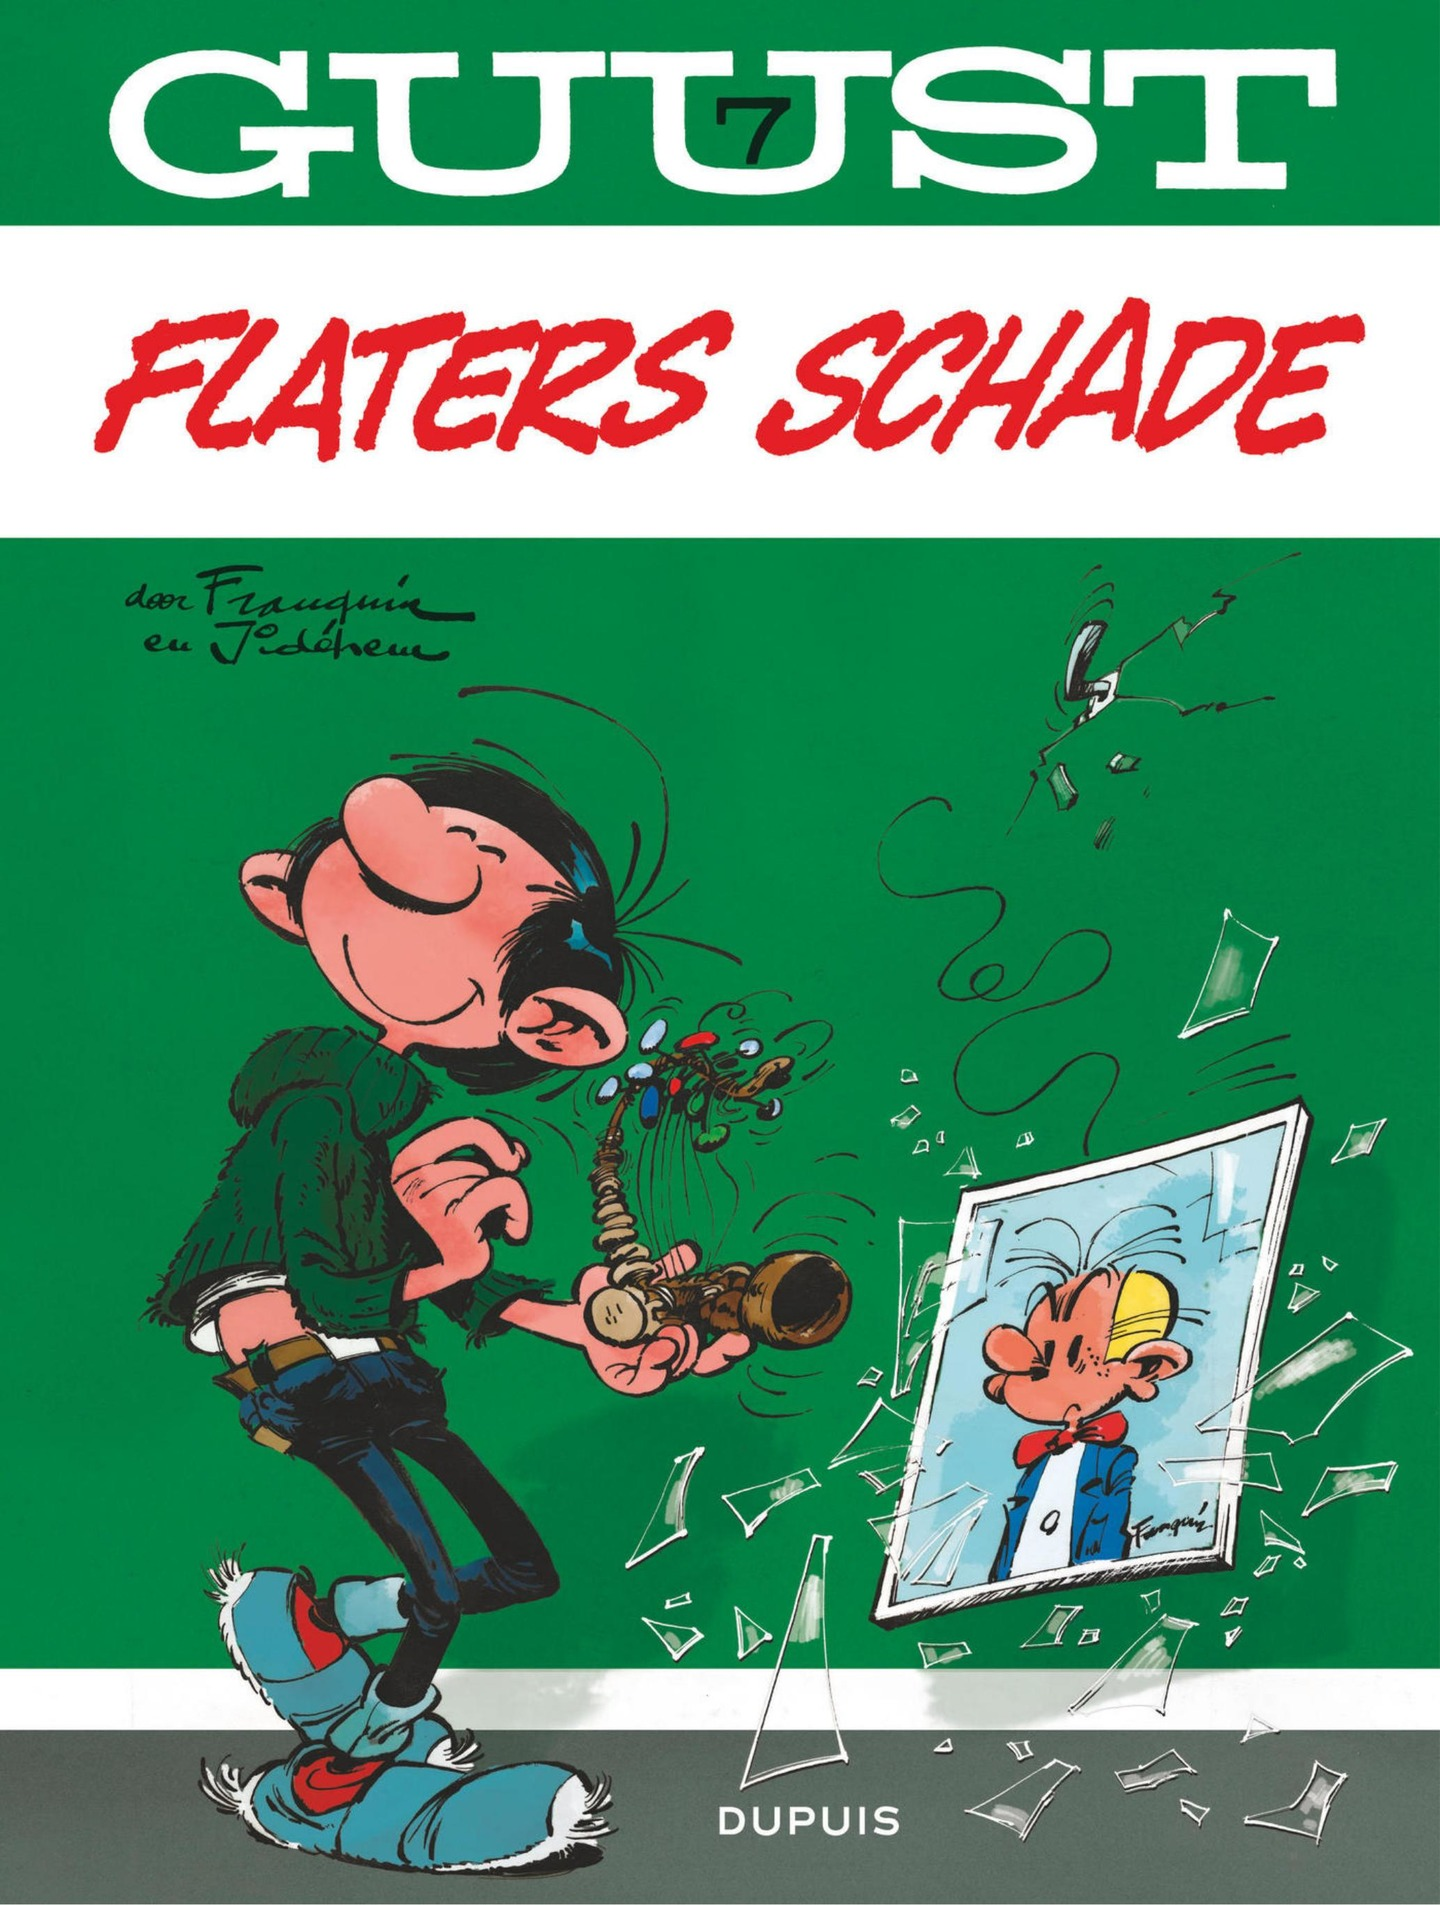 Flaters schade